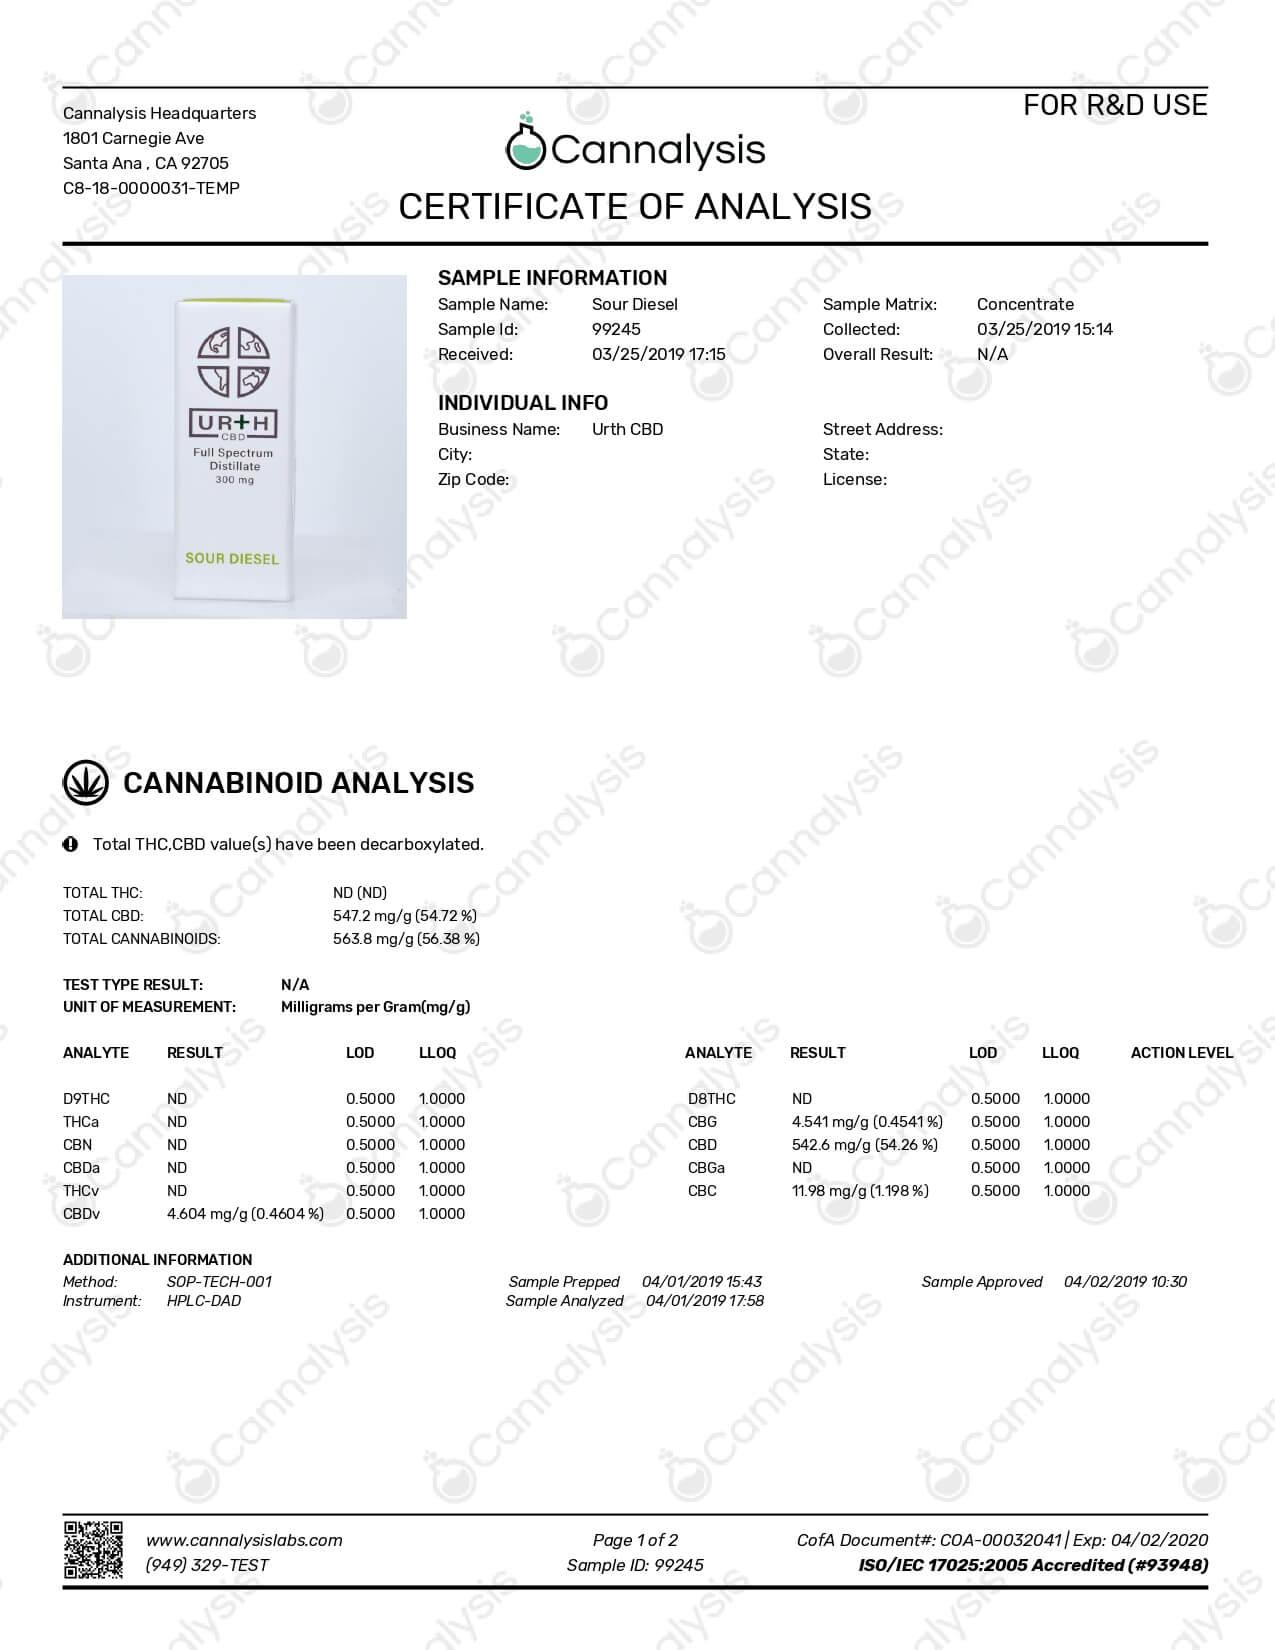 Urth CBD Cartridge Sour Diesel Energetic Lab Report